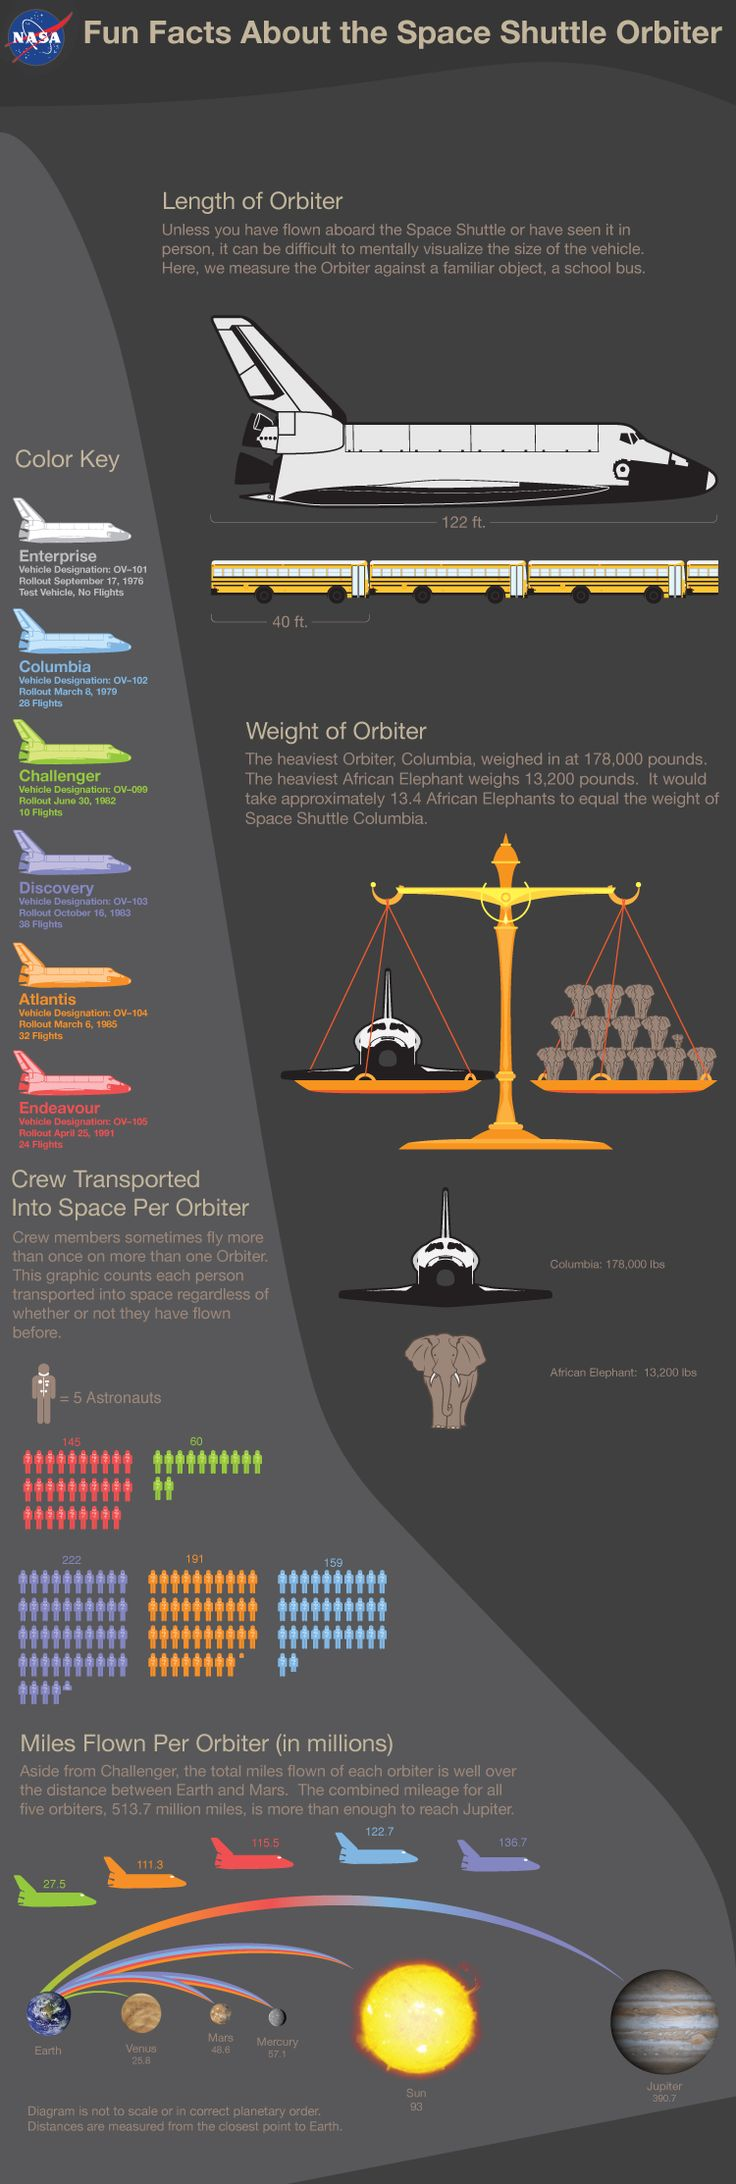 Space Shuttle Orbiter facts!